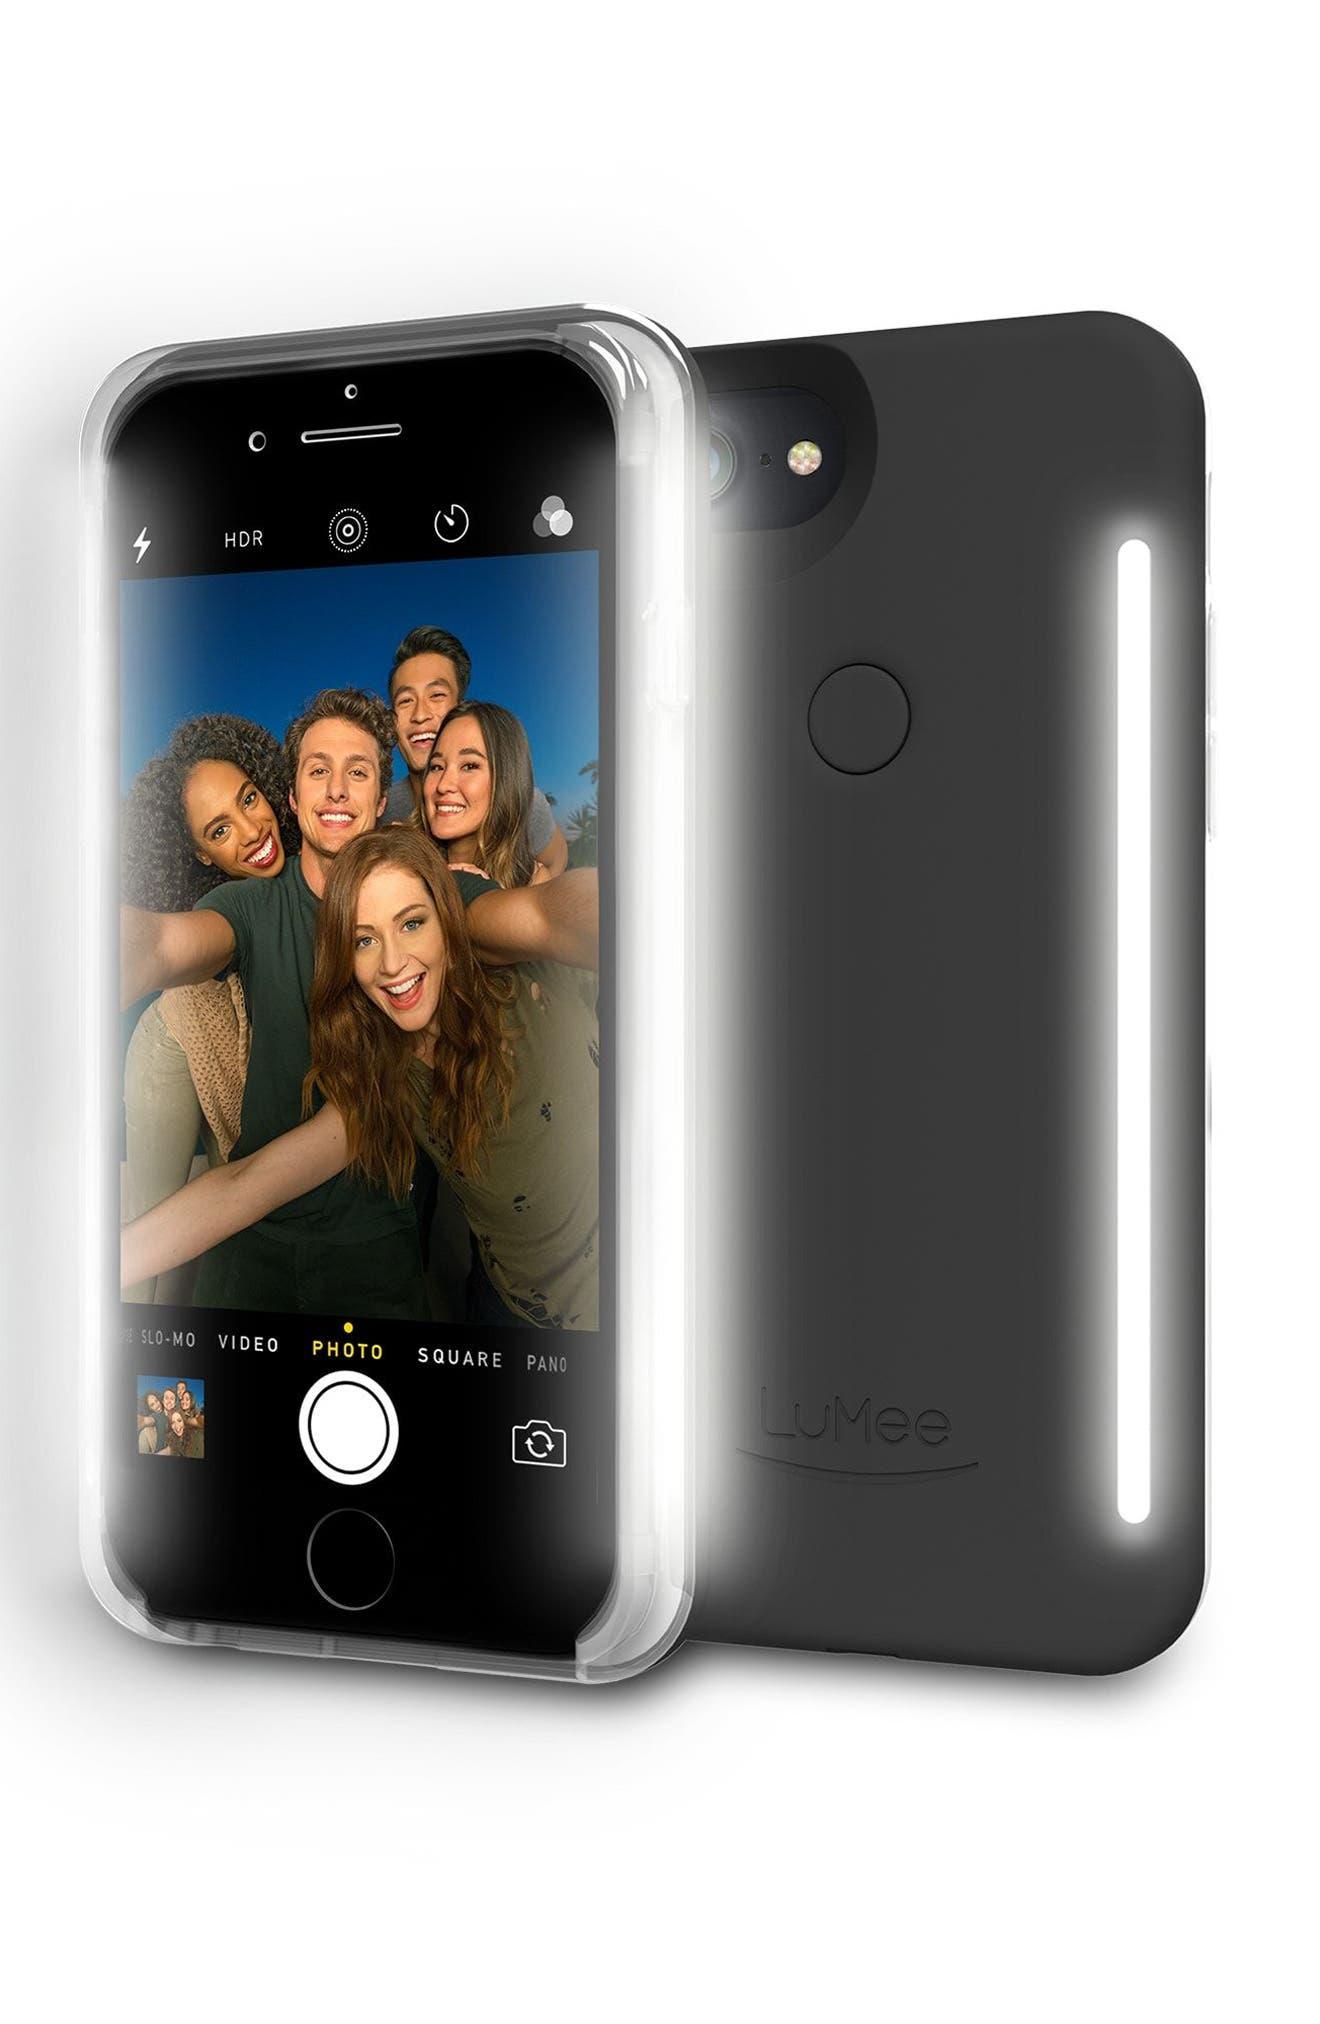 LuMee Duo LED Lighted iPhone 6/6s/7/8 & 6/6s/7/8 Plus Case